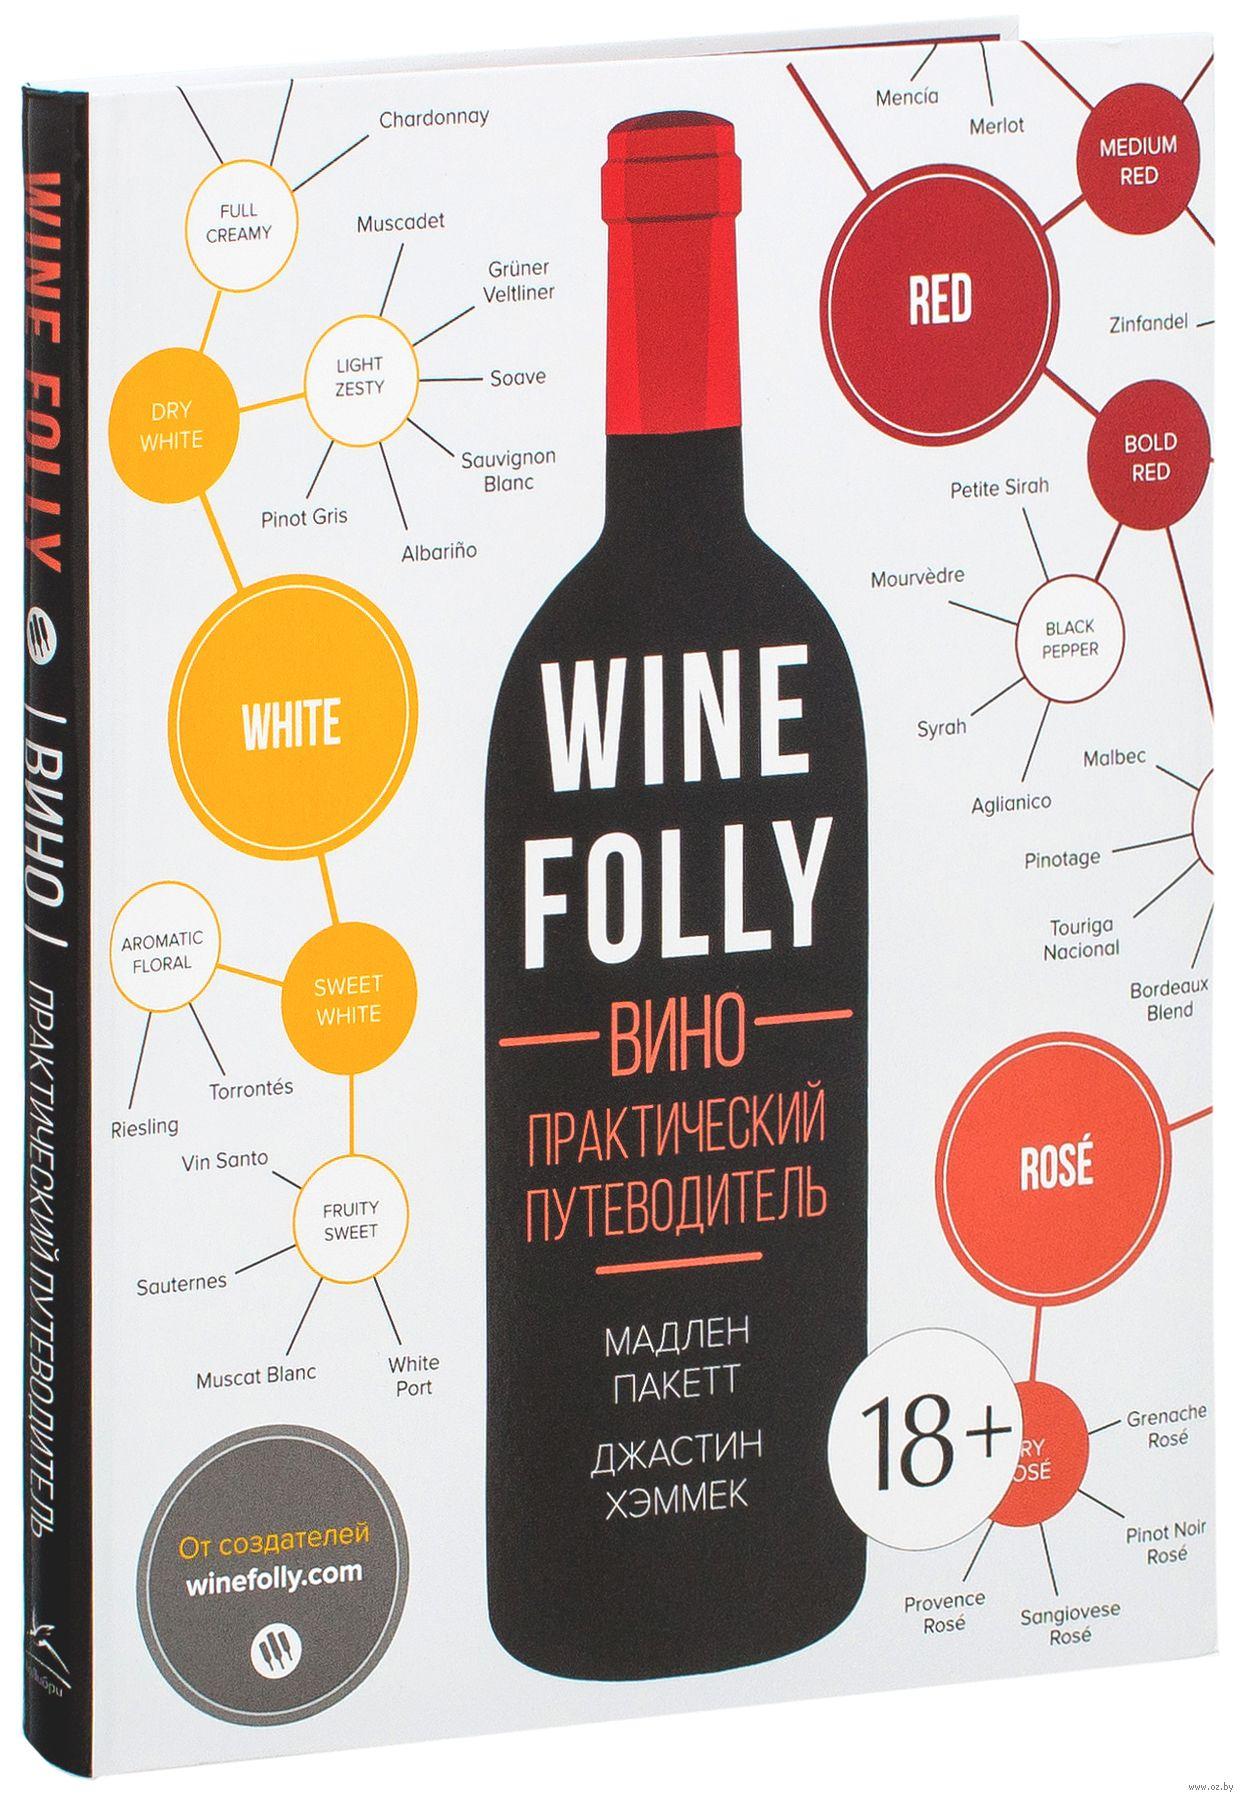 Wine Folly вино практический путеводитель на Oz By